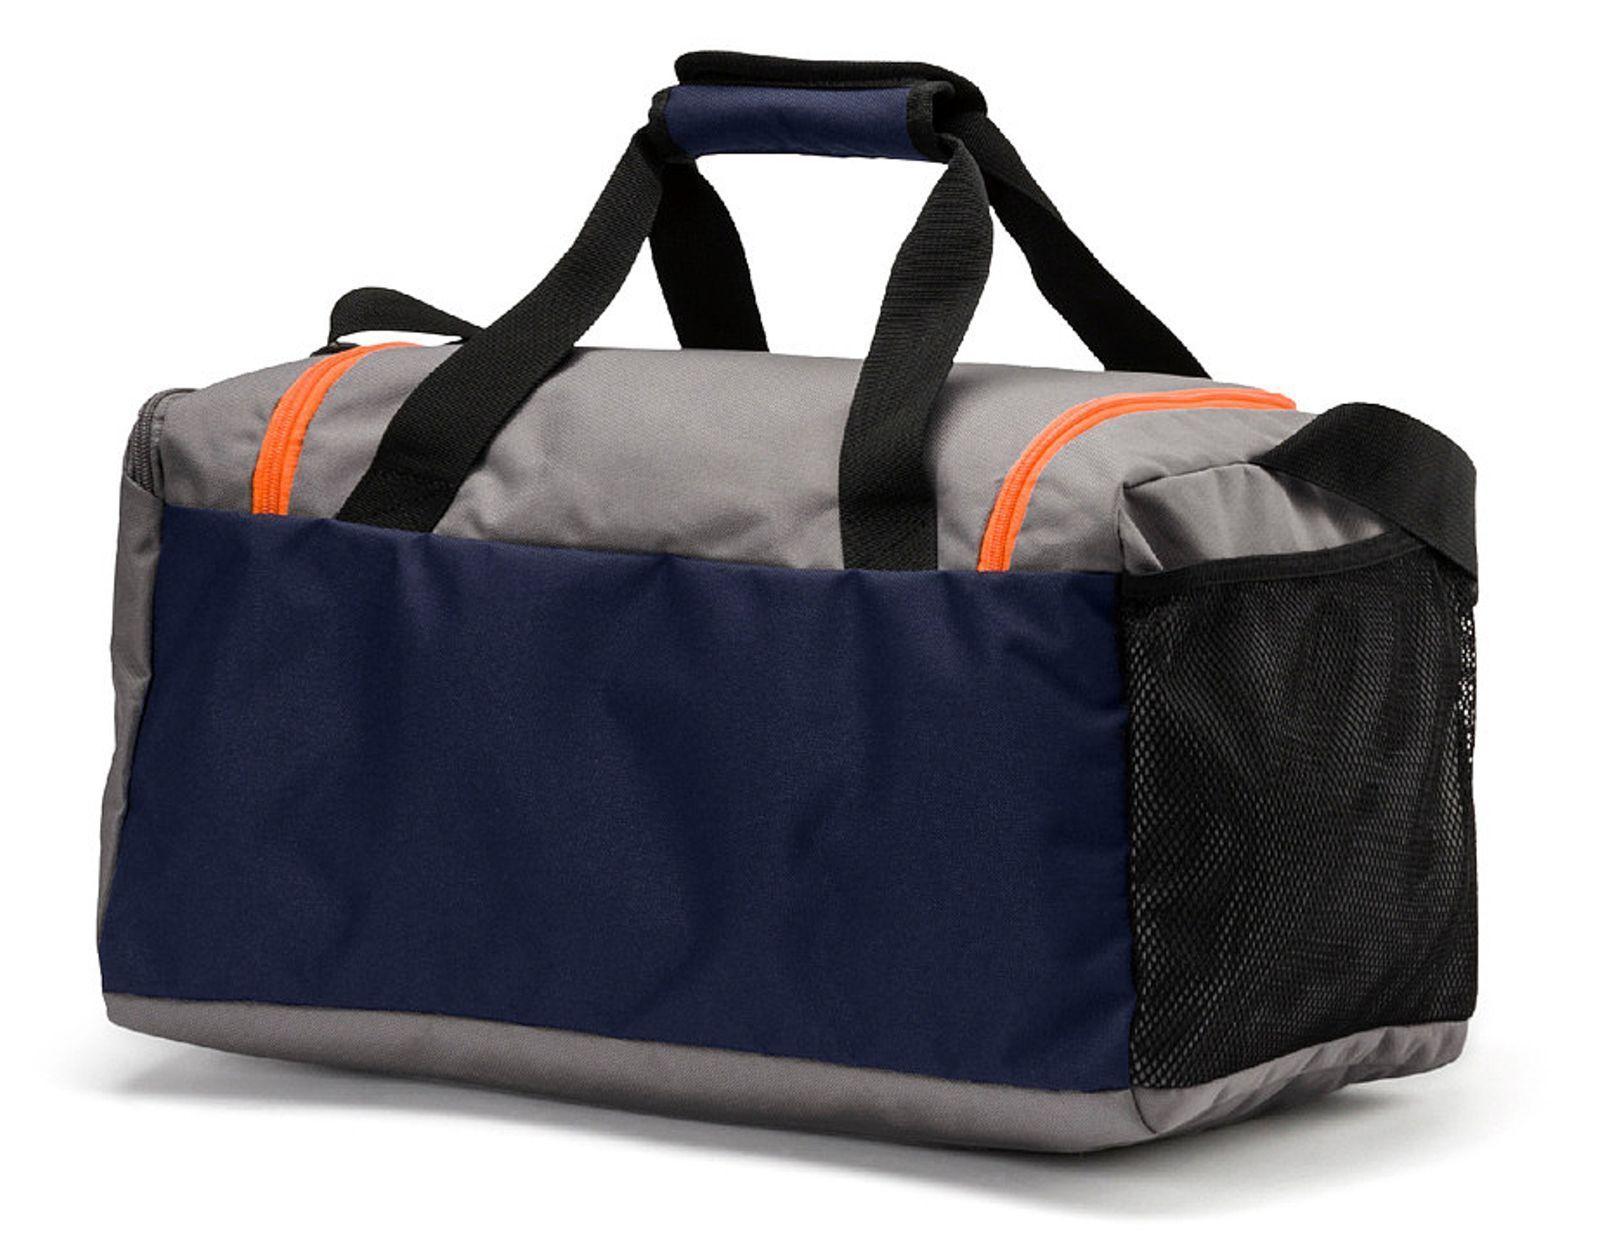 Mala Puma Peacoat Firecracker Sports Bag S